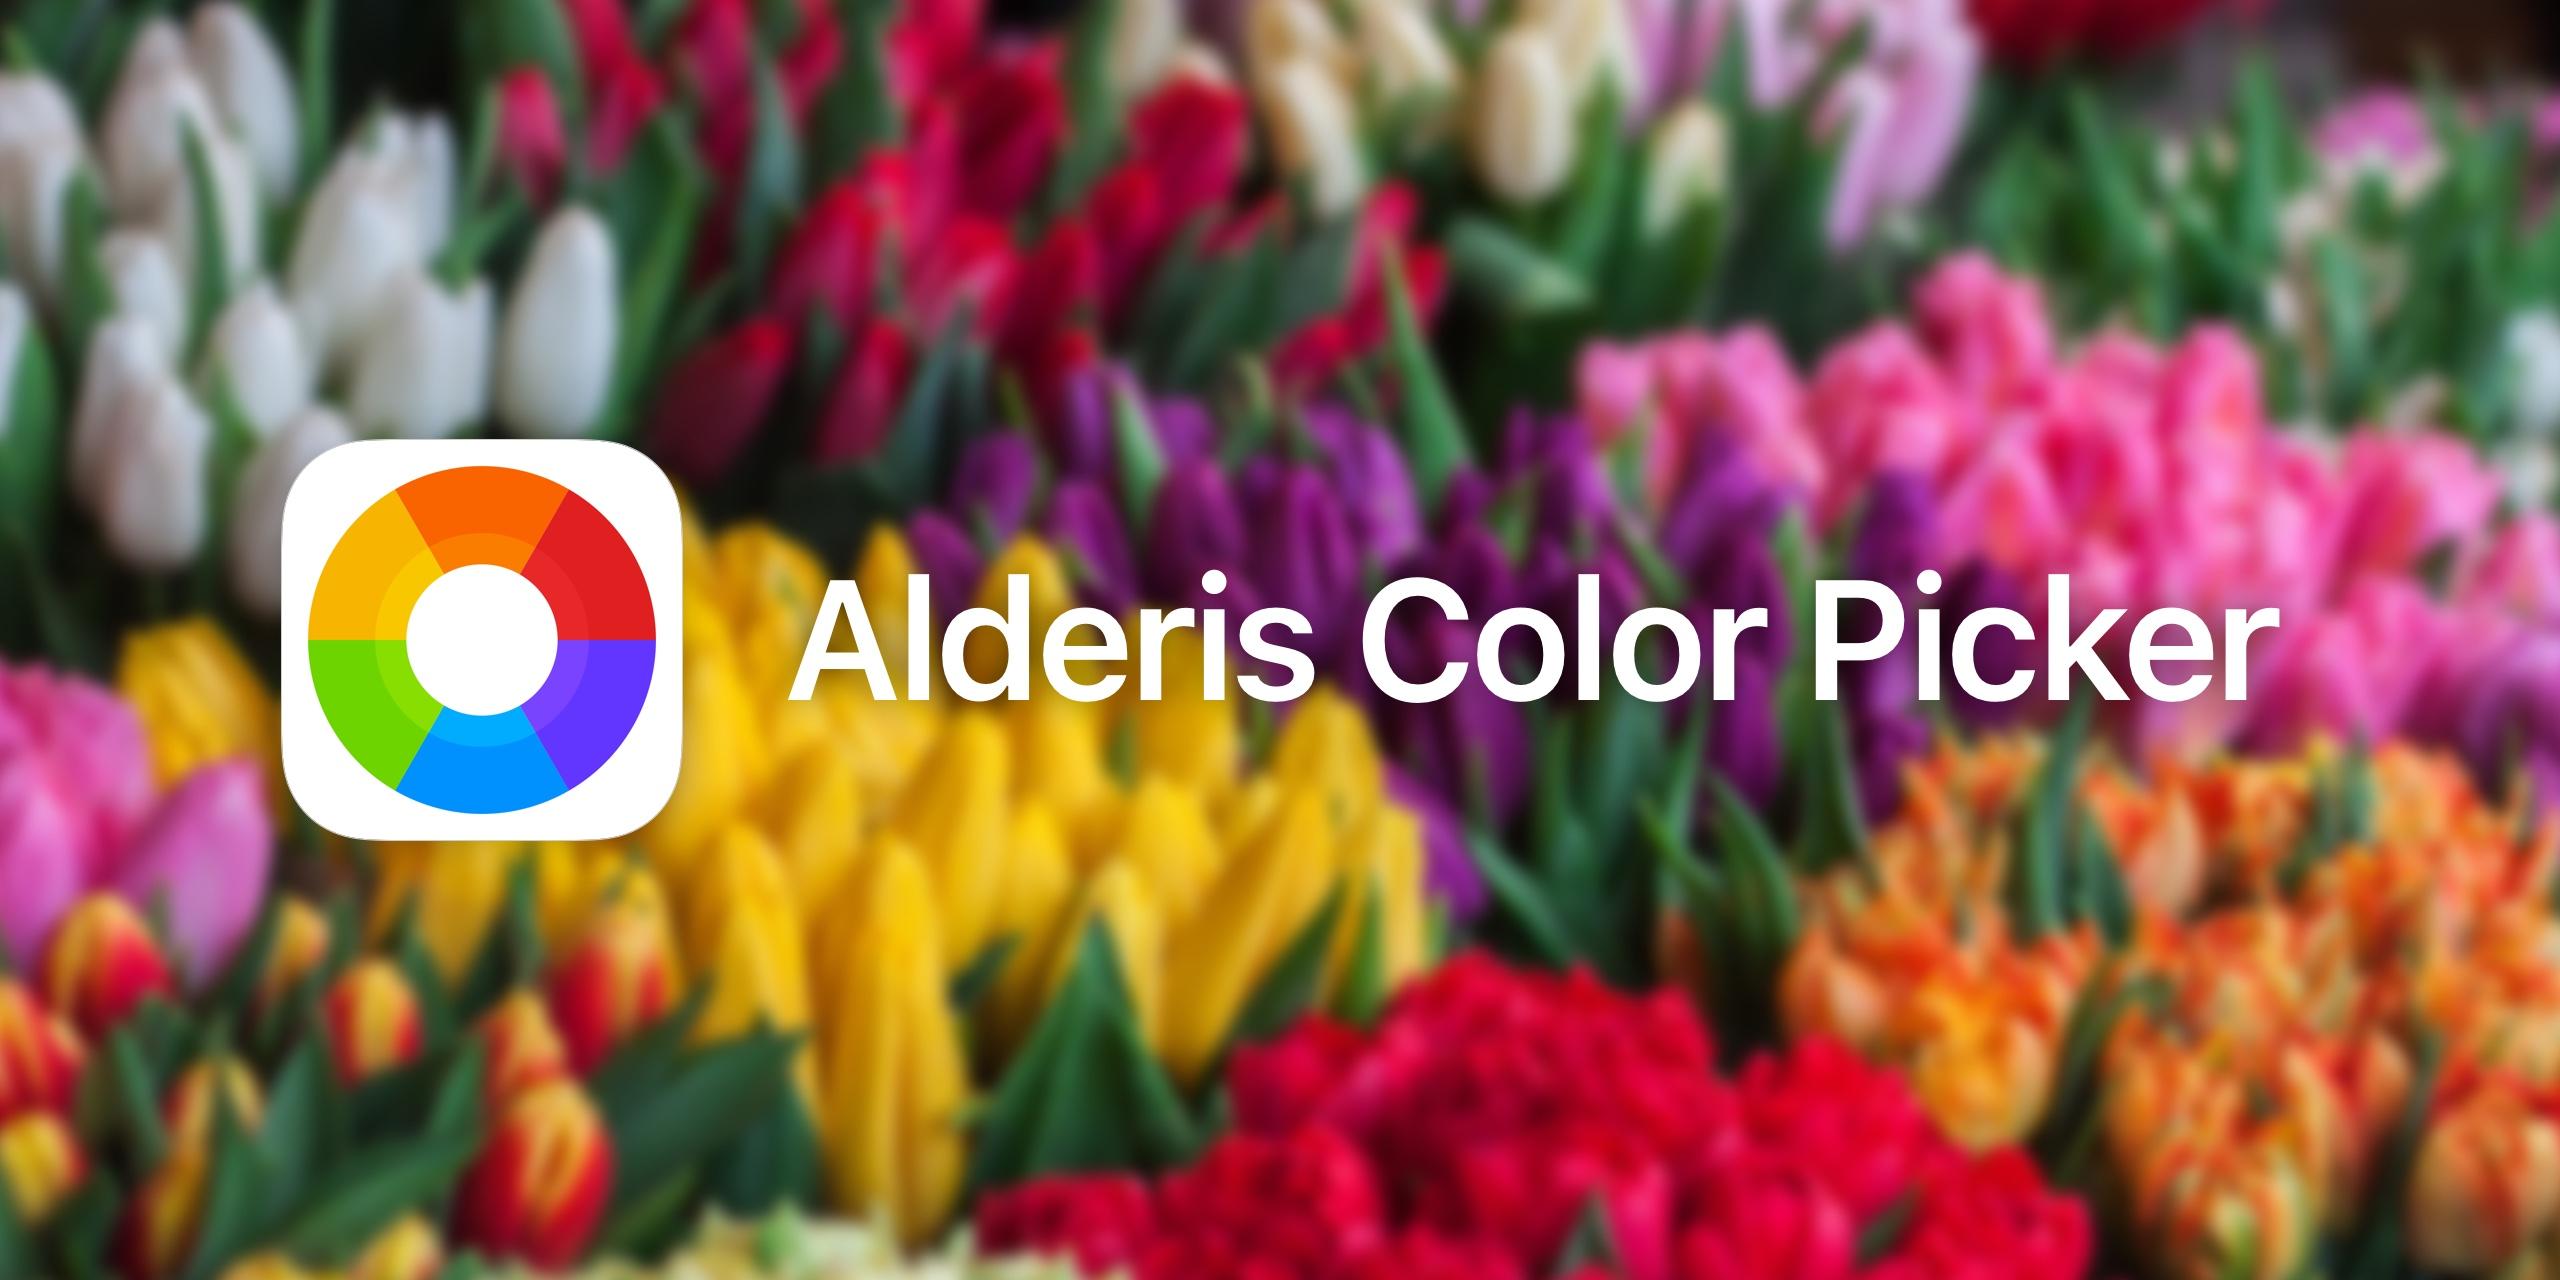 Alderis Color Picker